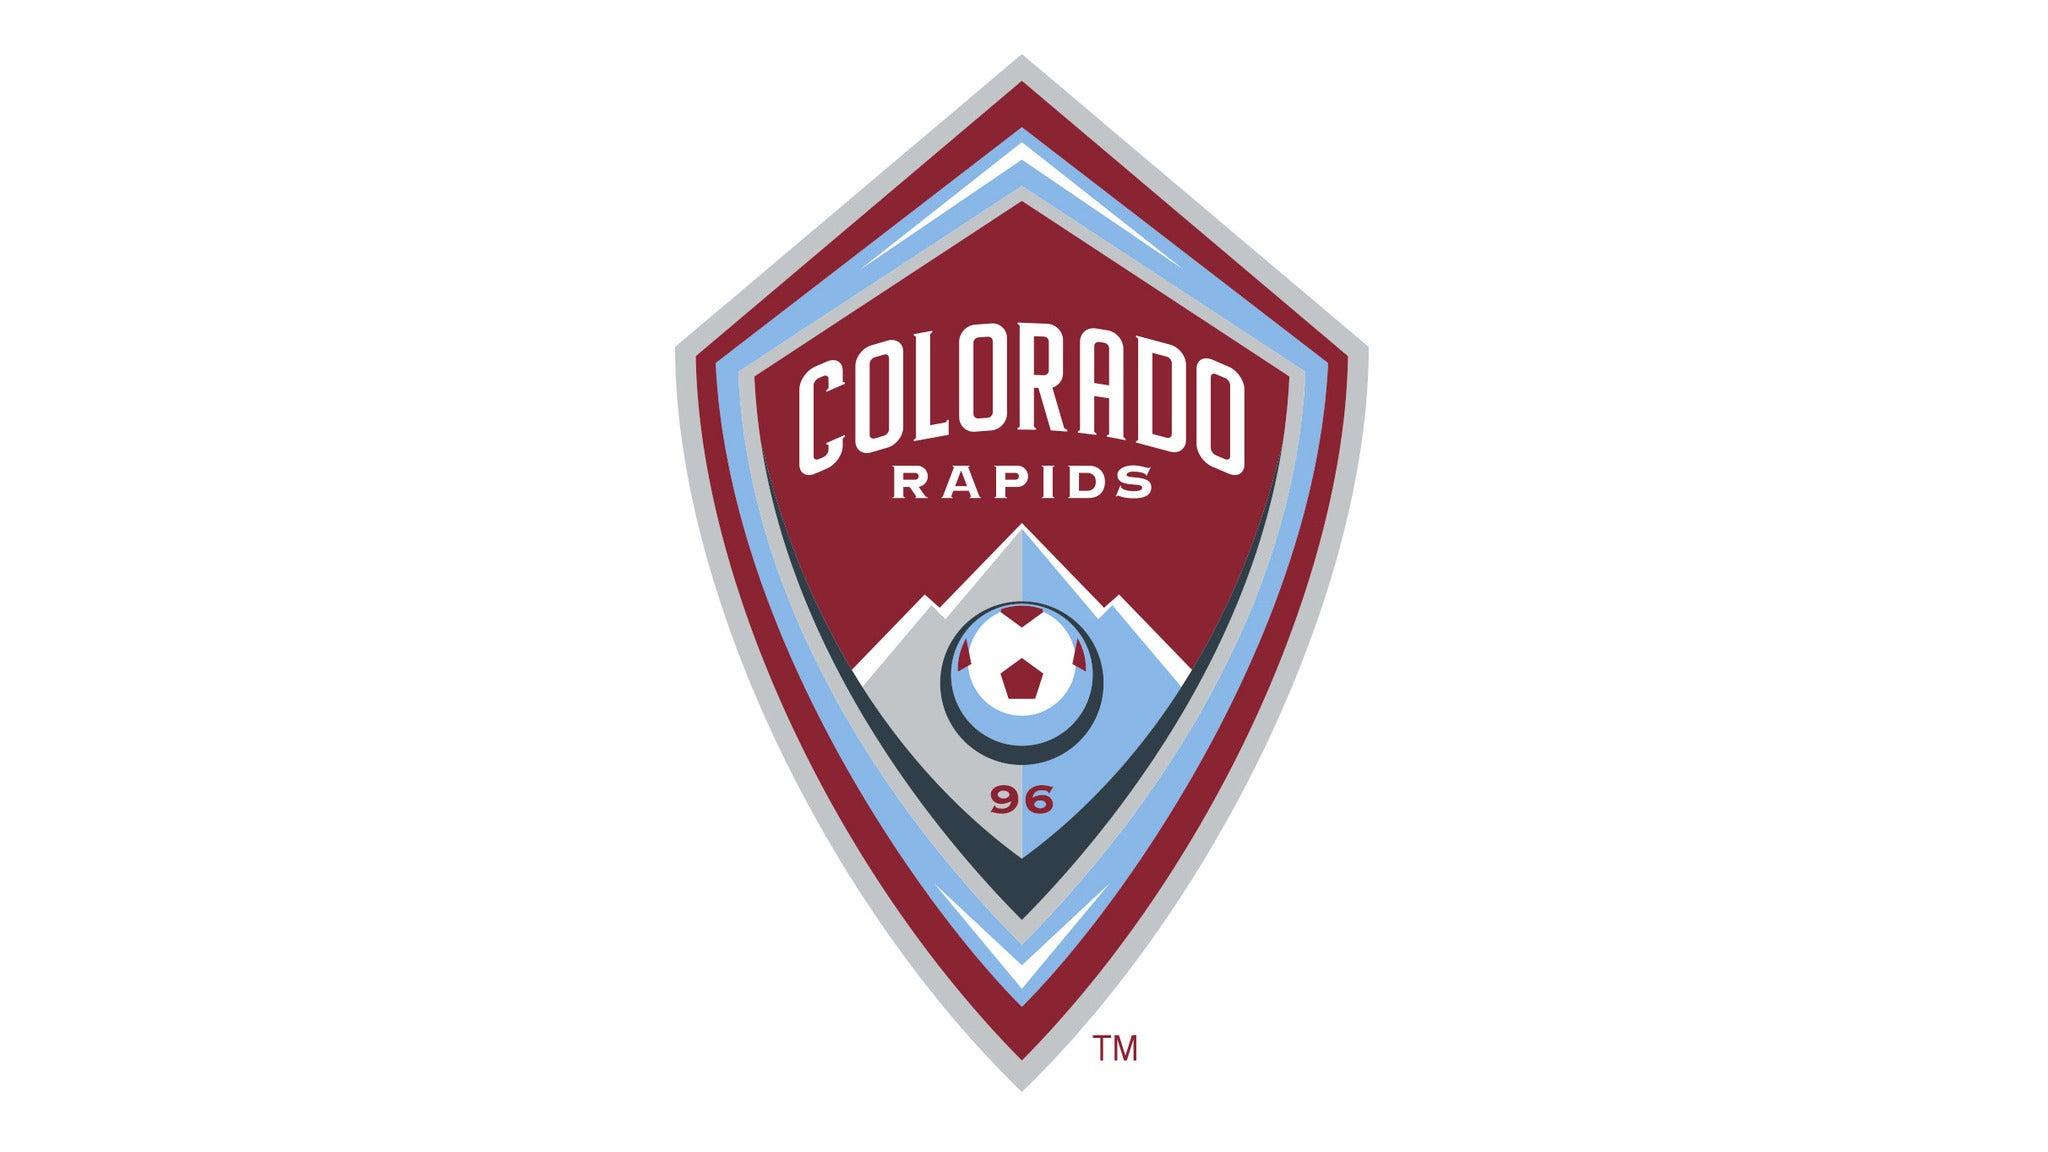 Colorado Rapids vs. New York City FC